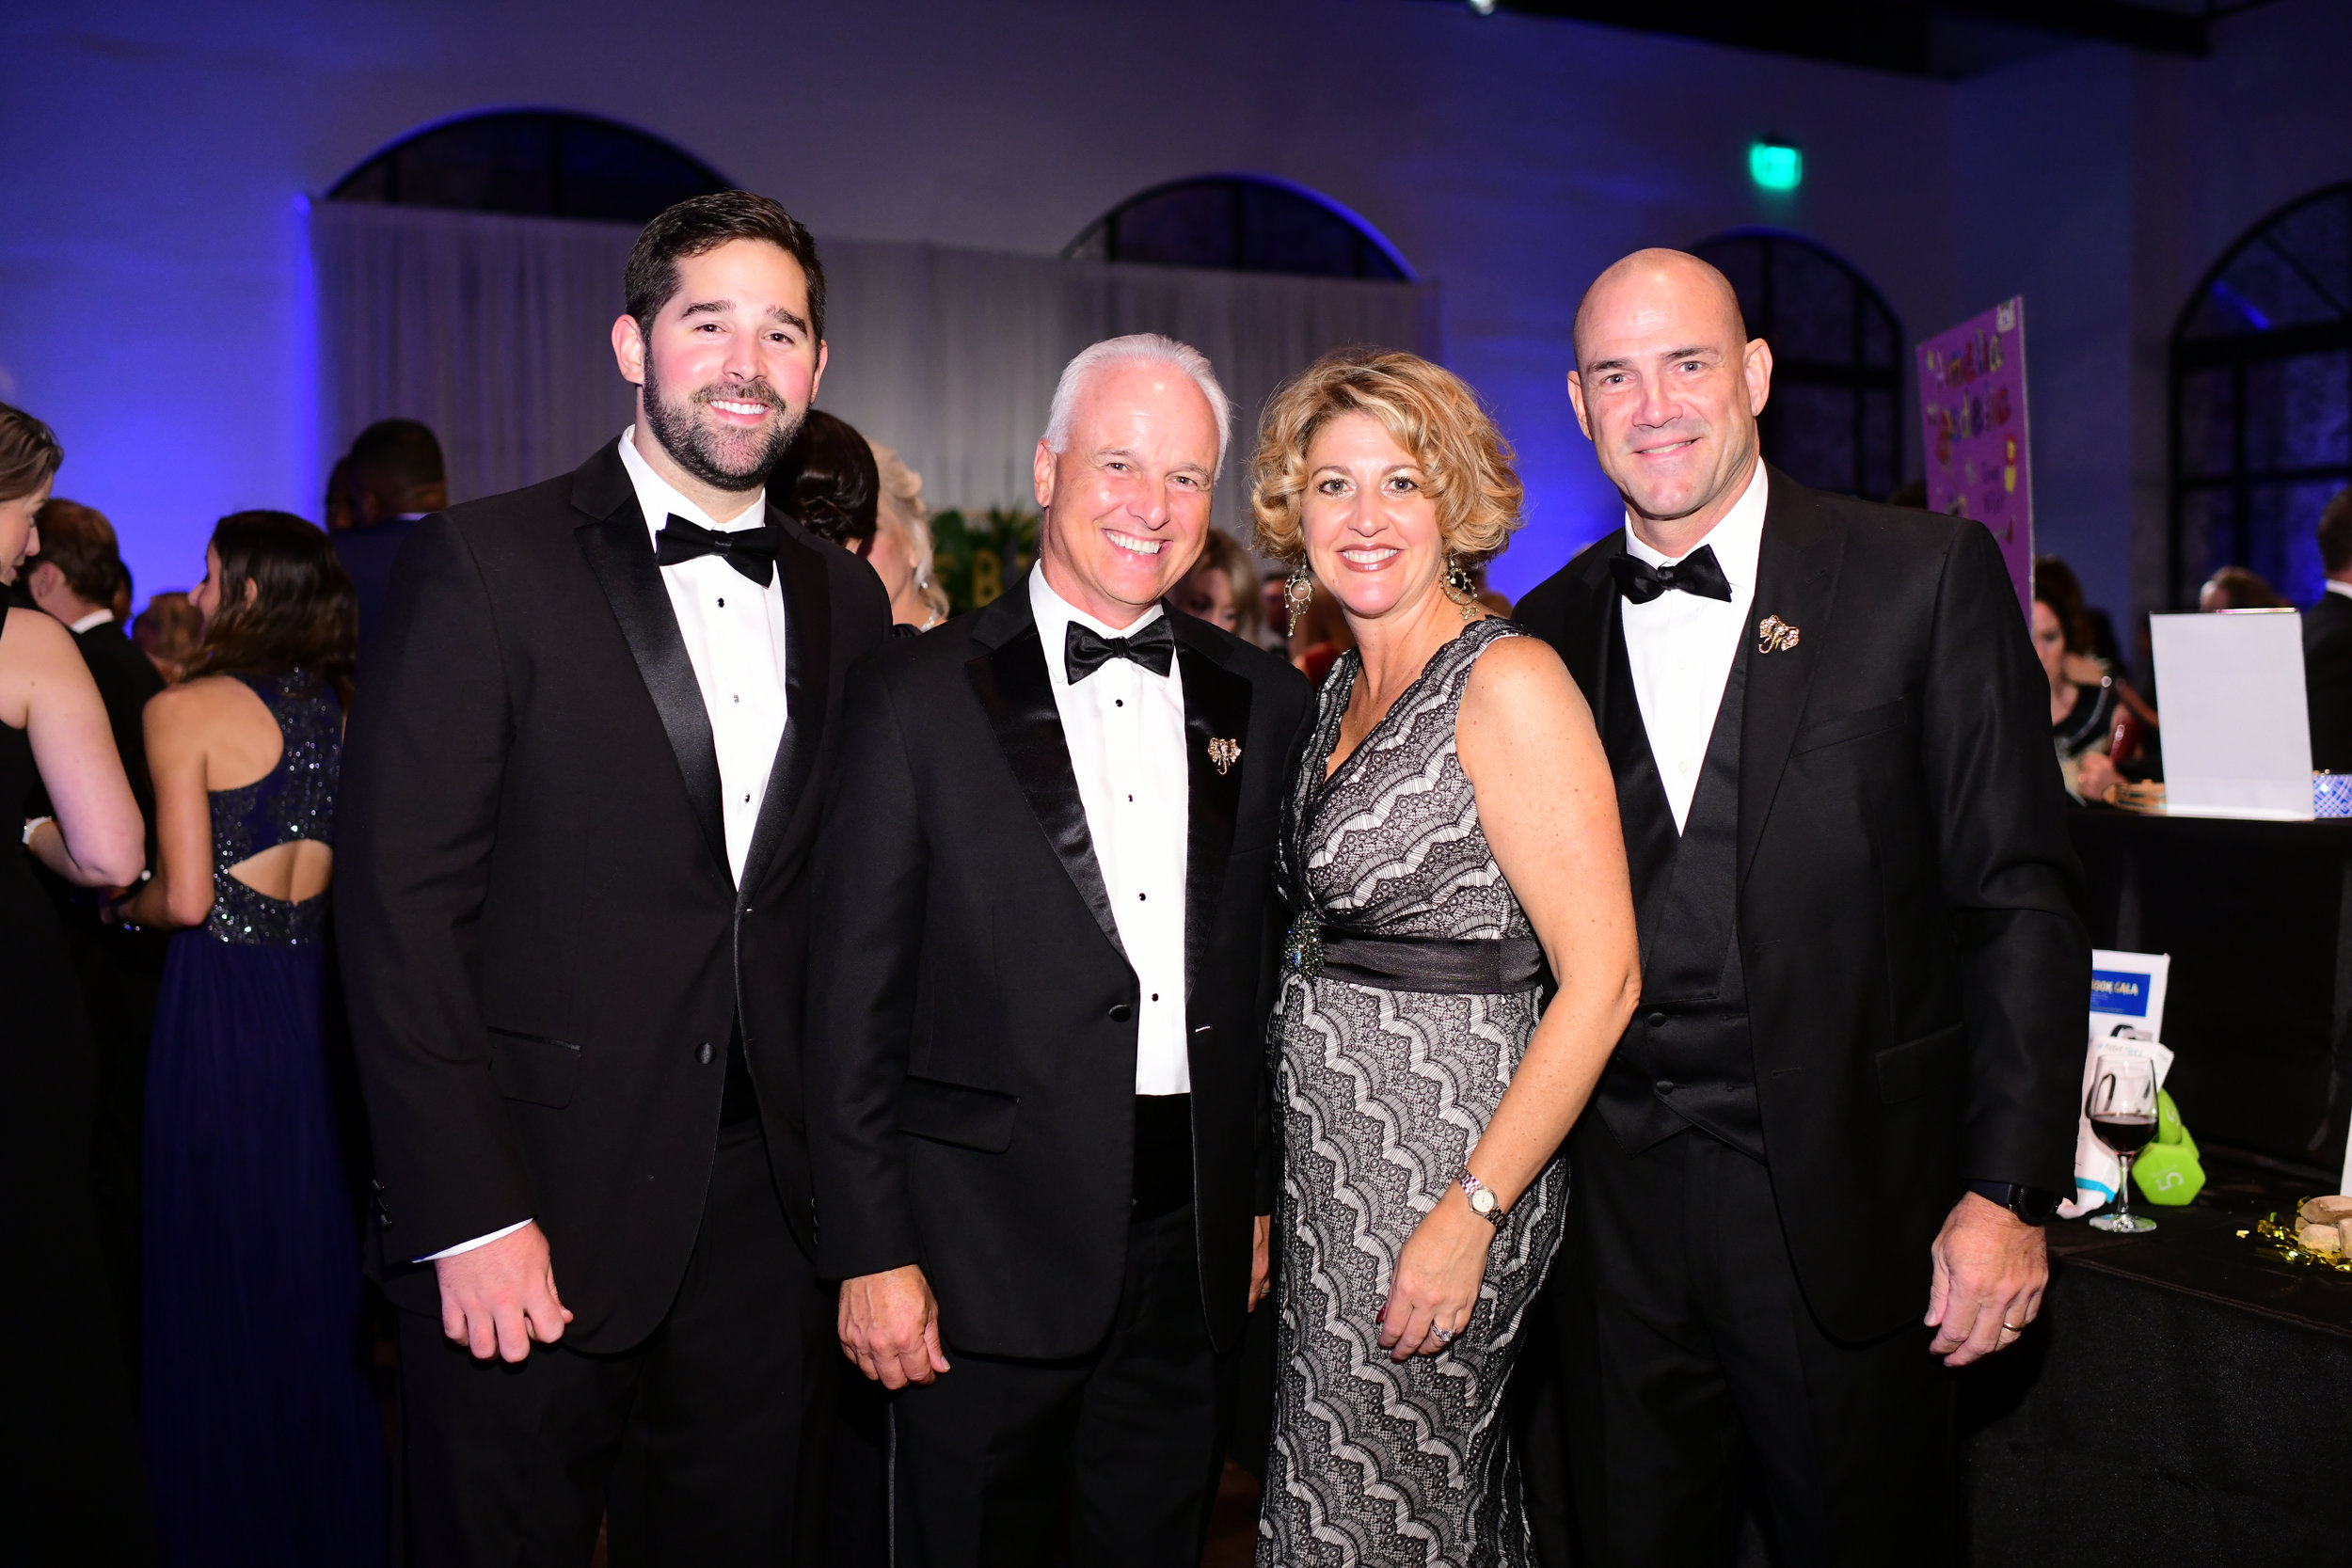 Preston Schulze, Mark Jakel, Janna and Steve Roberson; Photo by Daniel Ortiz.jpg